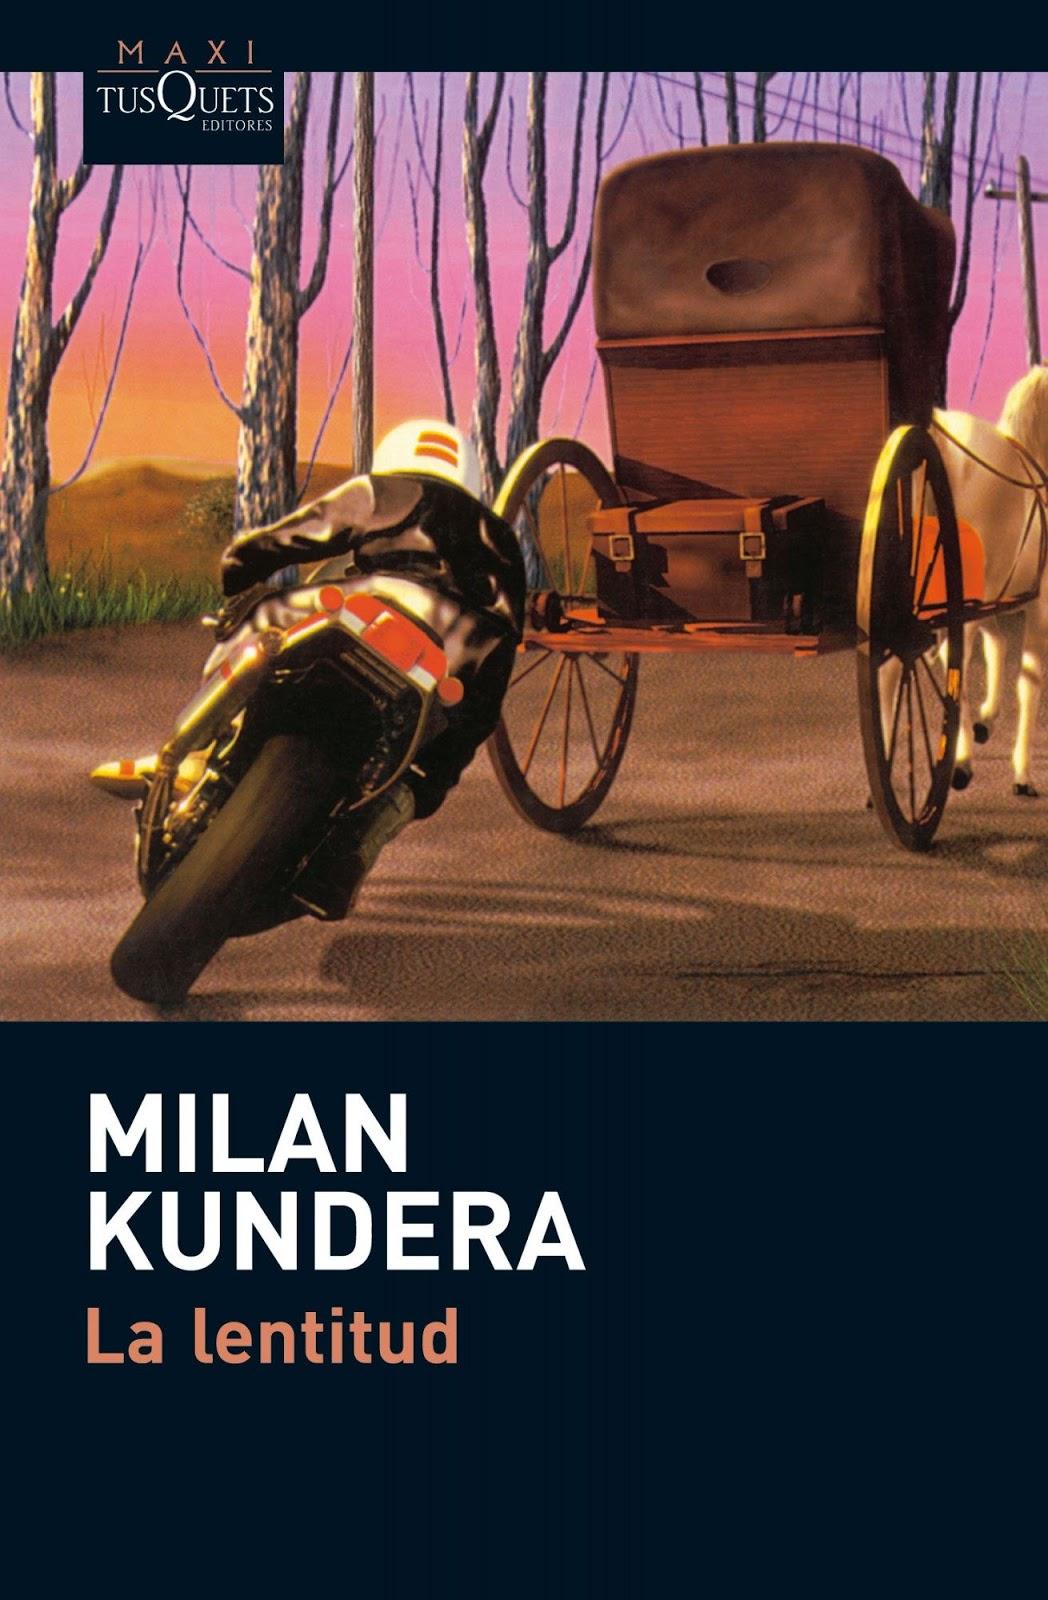 La lentitud – Milan Kundera